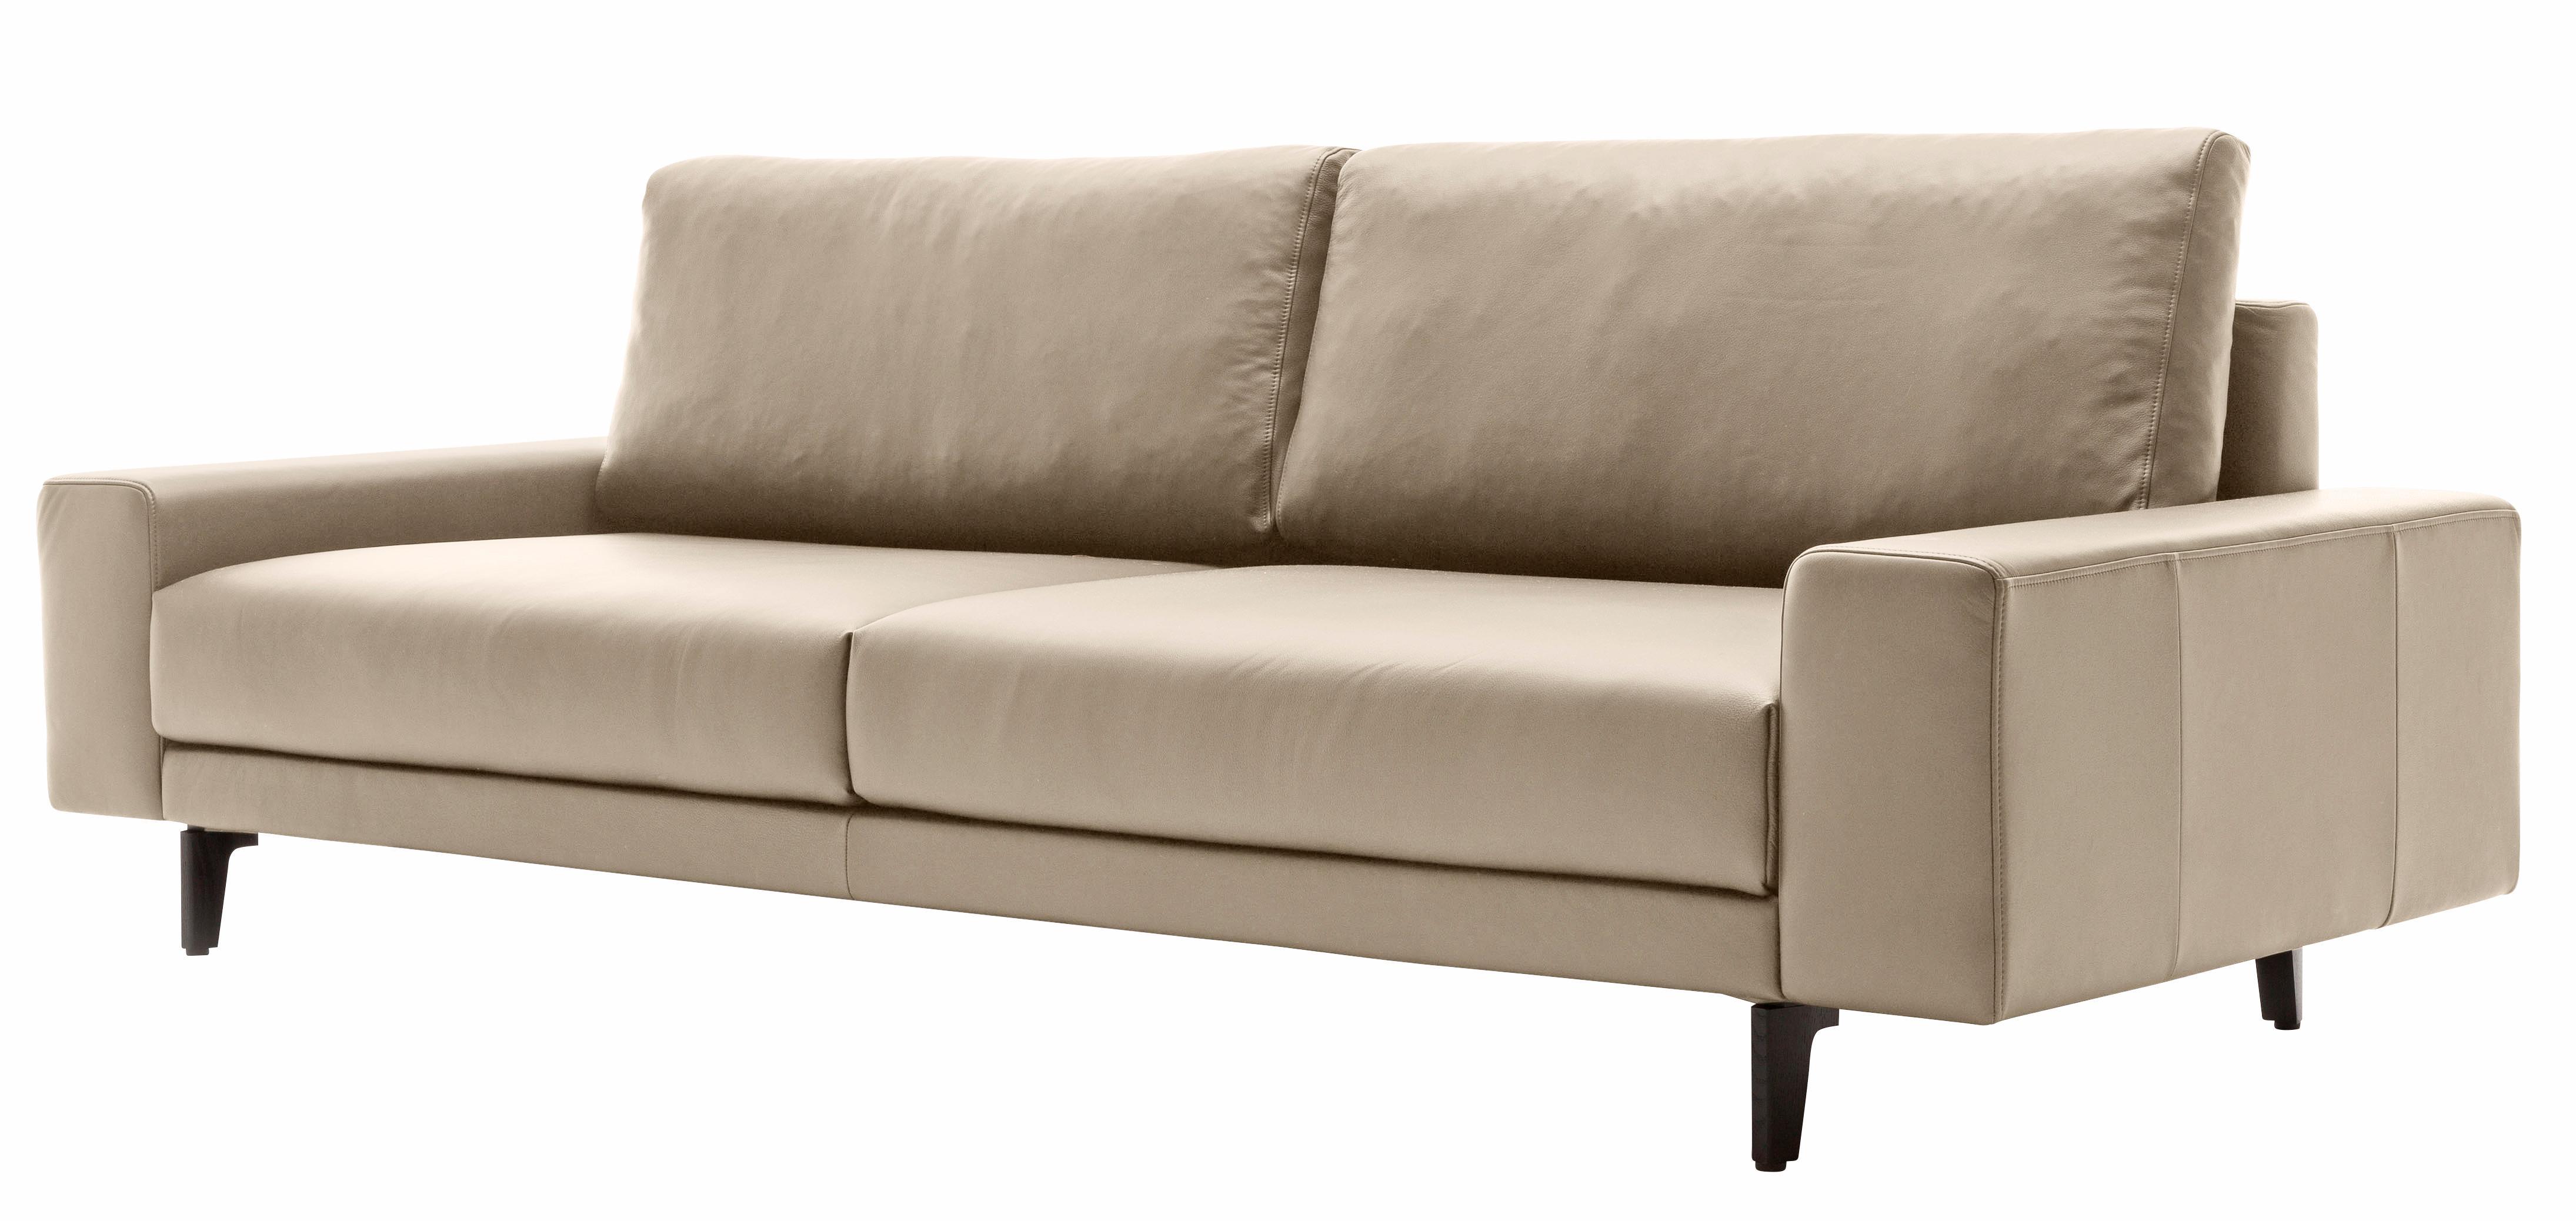 home24 sofa benavente i 2 sitzer microfaser aws velbert. Black Bedroom Furniture Sets. Home Design Ideas